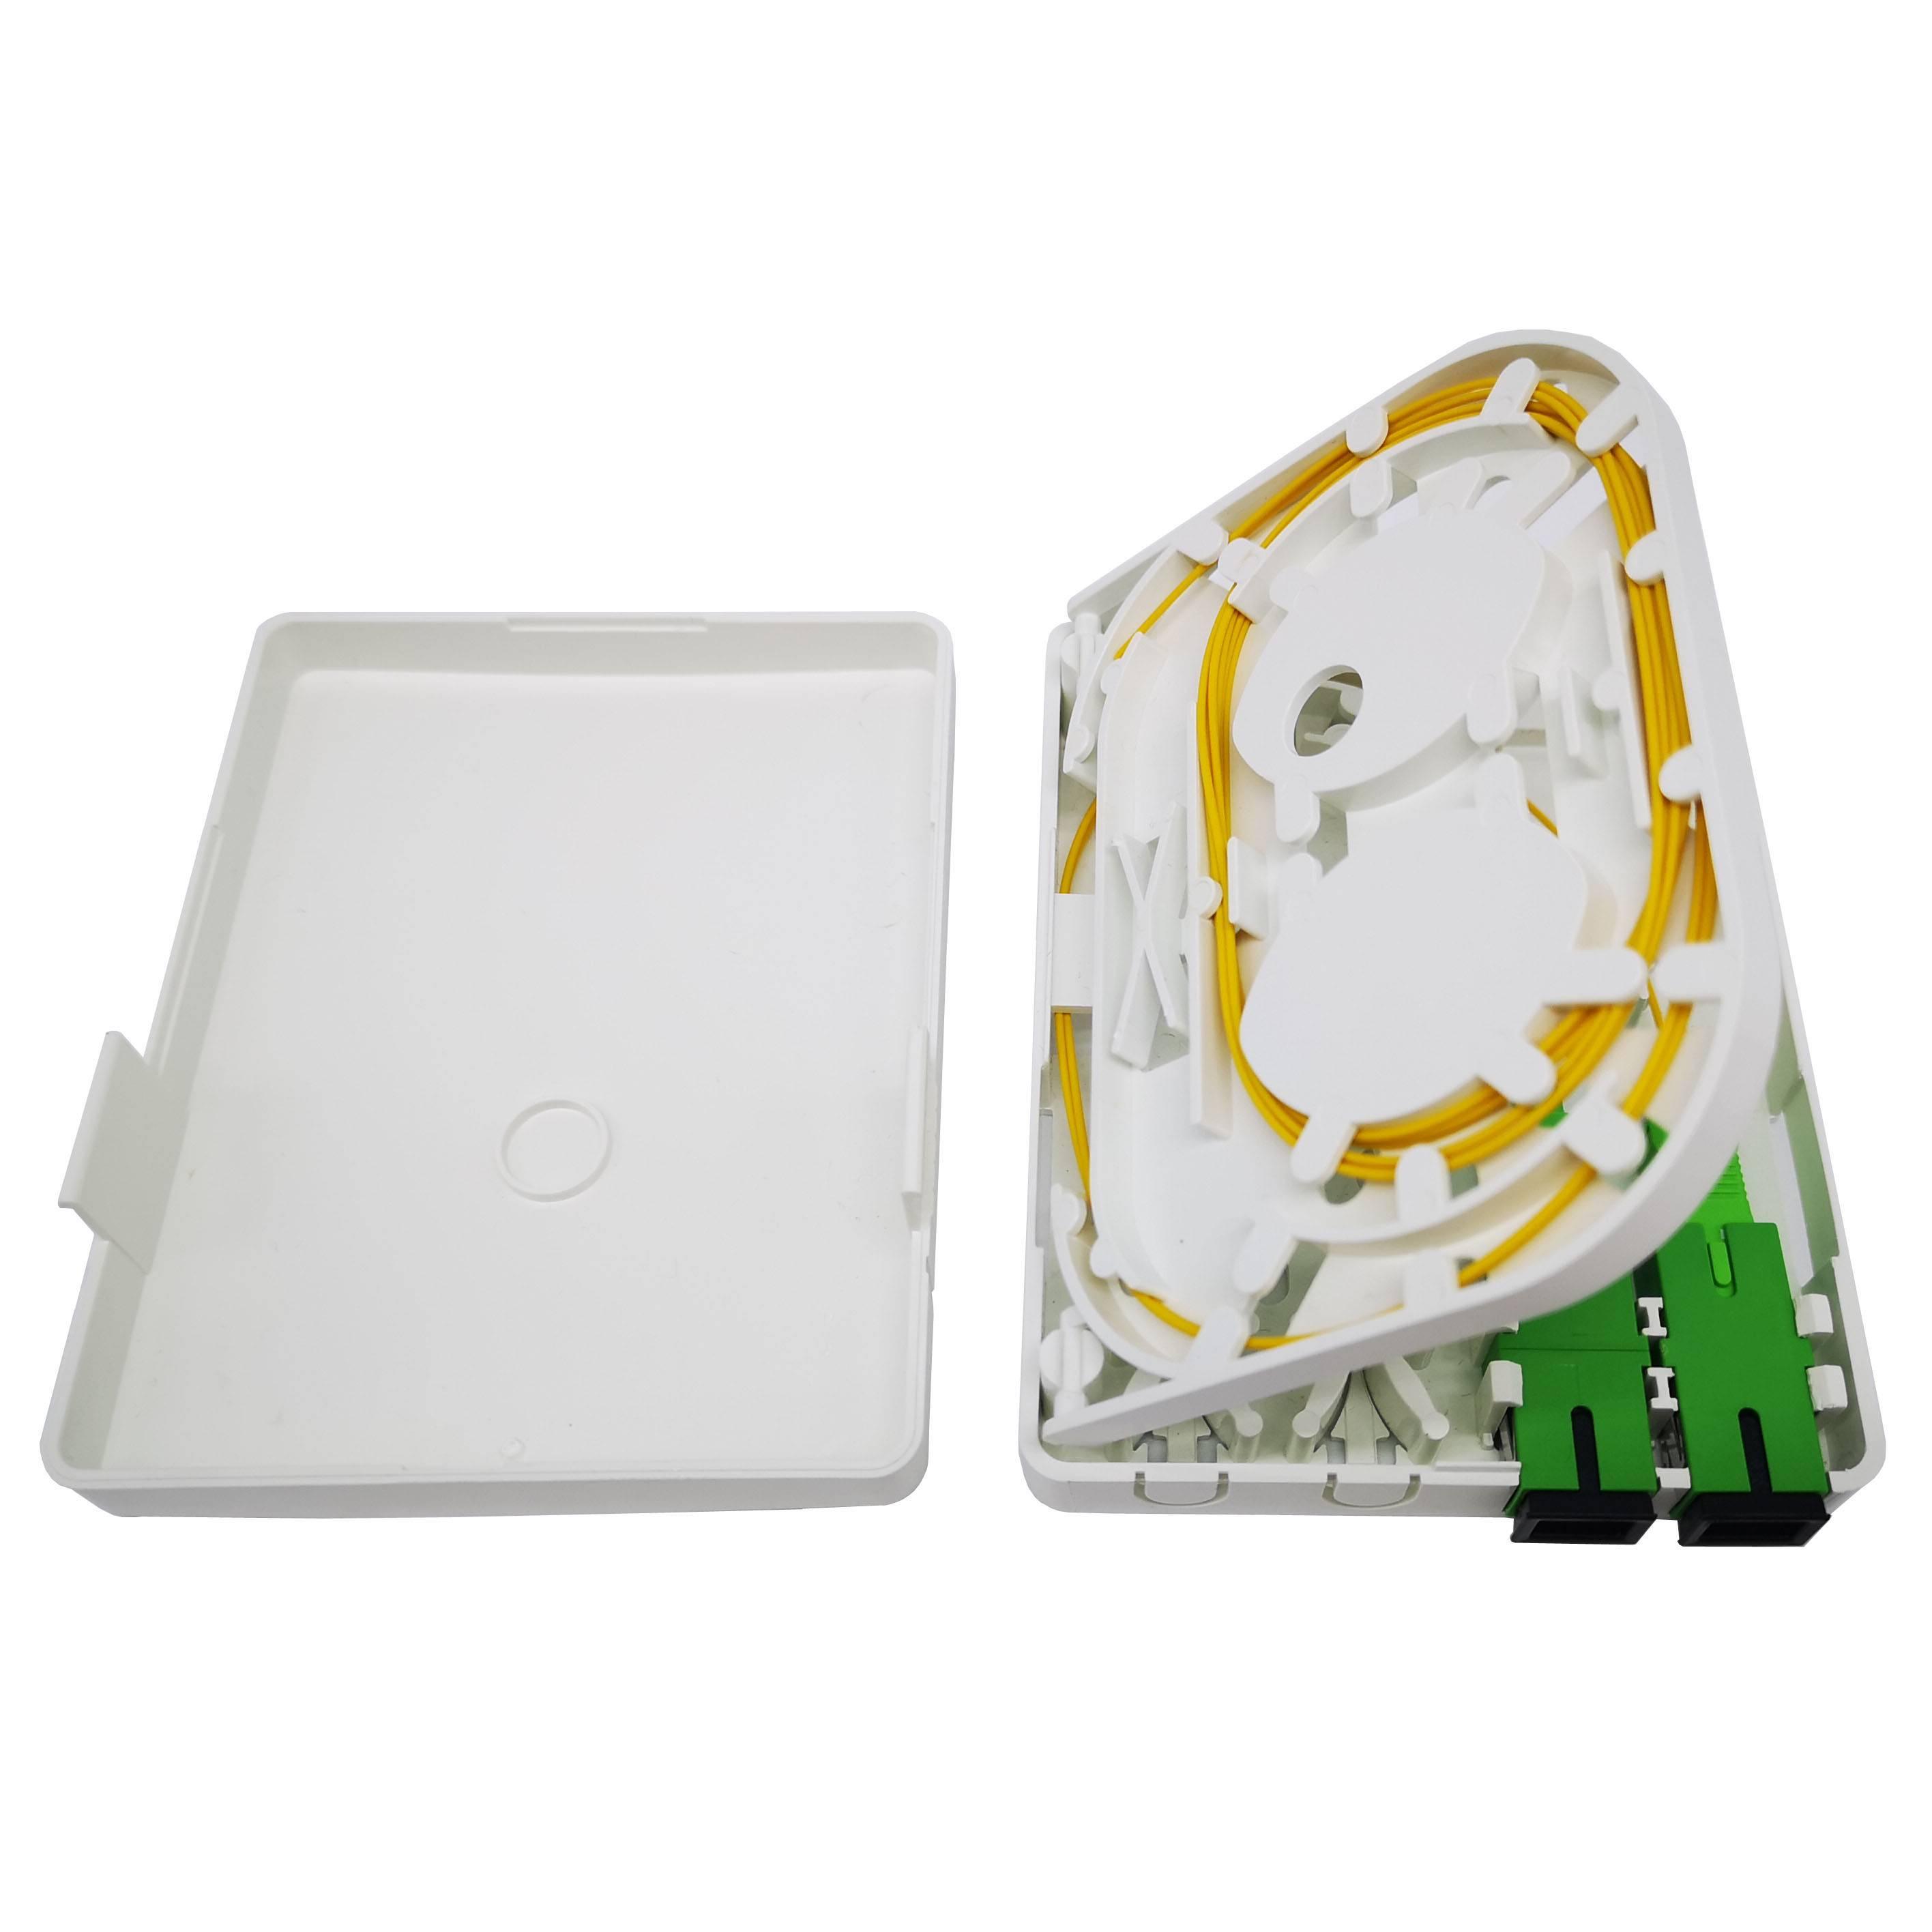 FTB86M fiber optic wall plate outlet  for 2 fibers